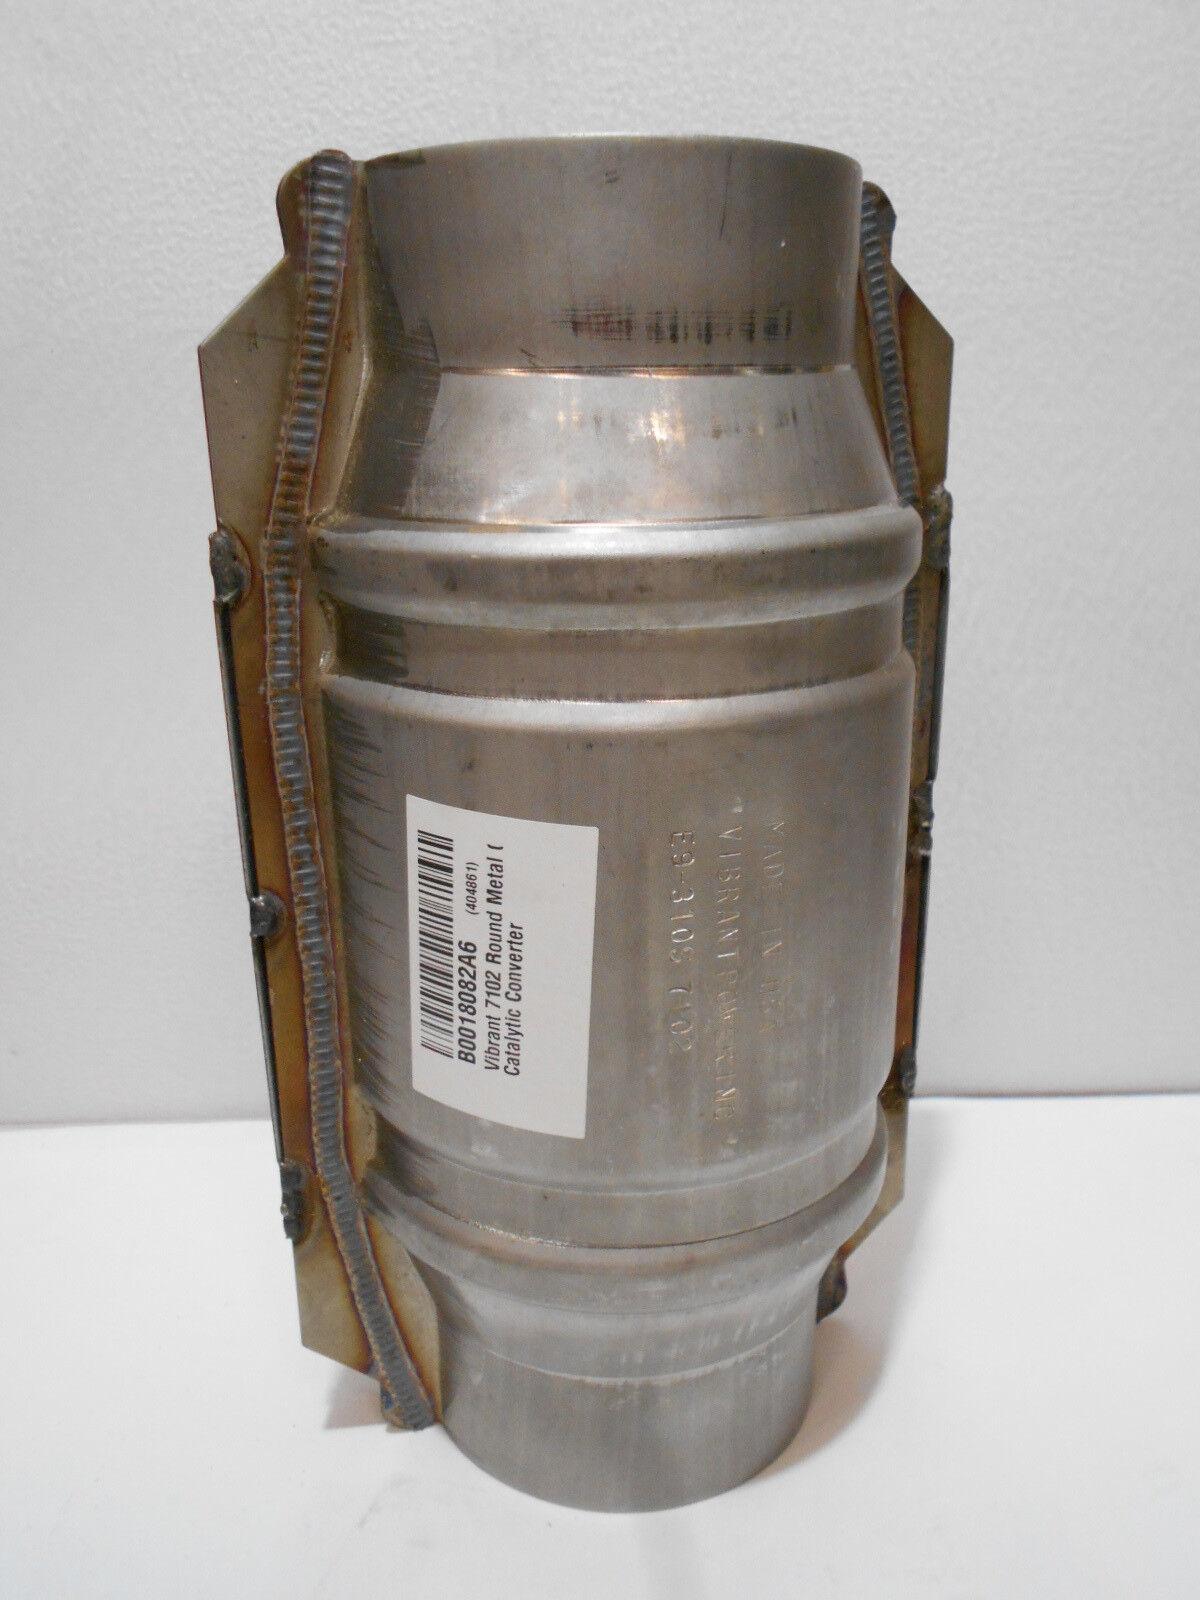 Vibrant 7102 Round Metal Core Catalytic Converter